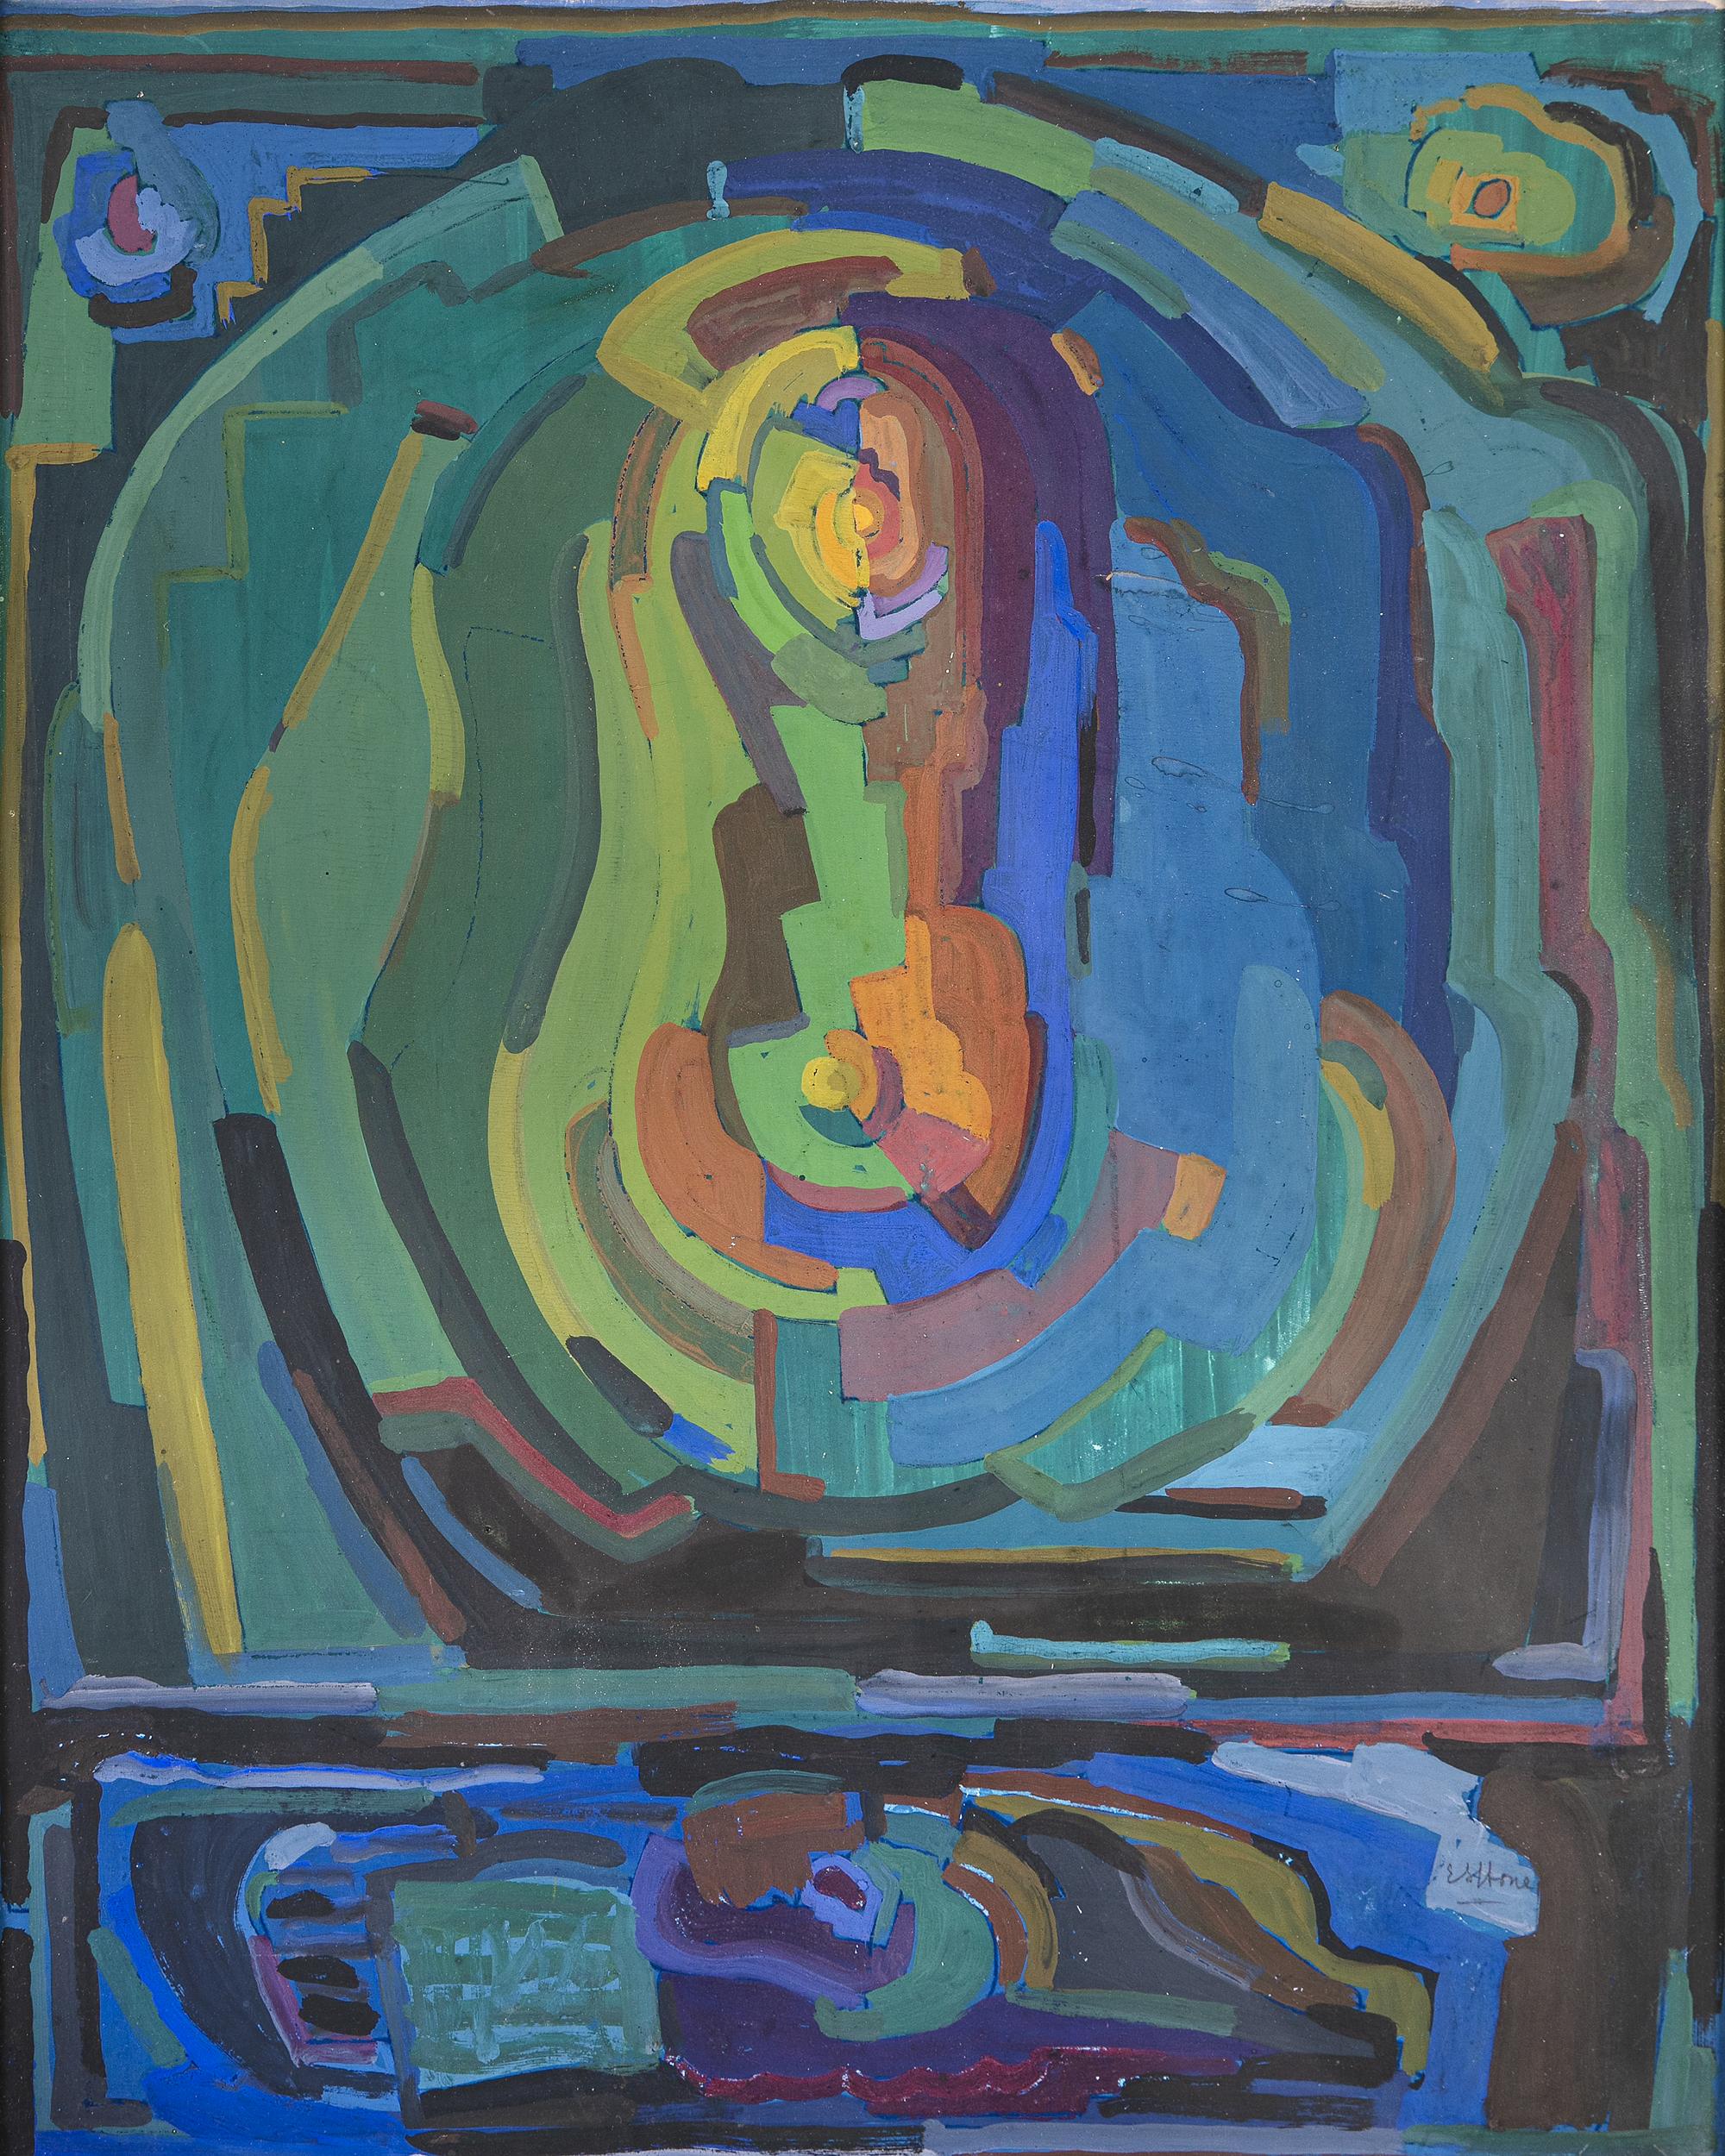 Lot 11 - Evie Hone HRHA (1894-1955)Painting (c.1928)Gouache on paper board, 54 x 42cm (21¼ x 16½)